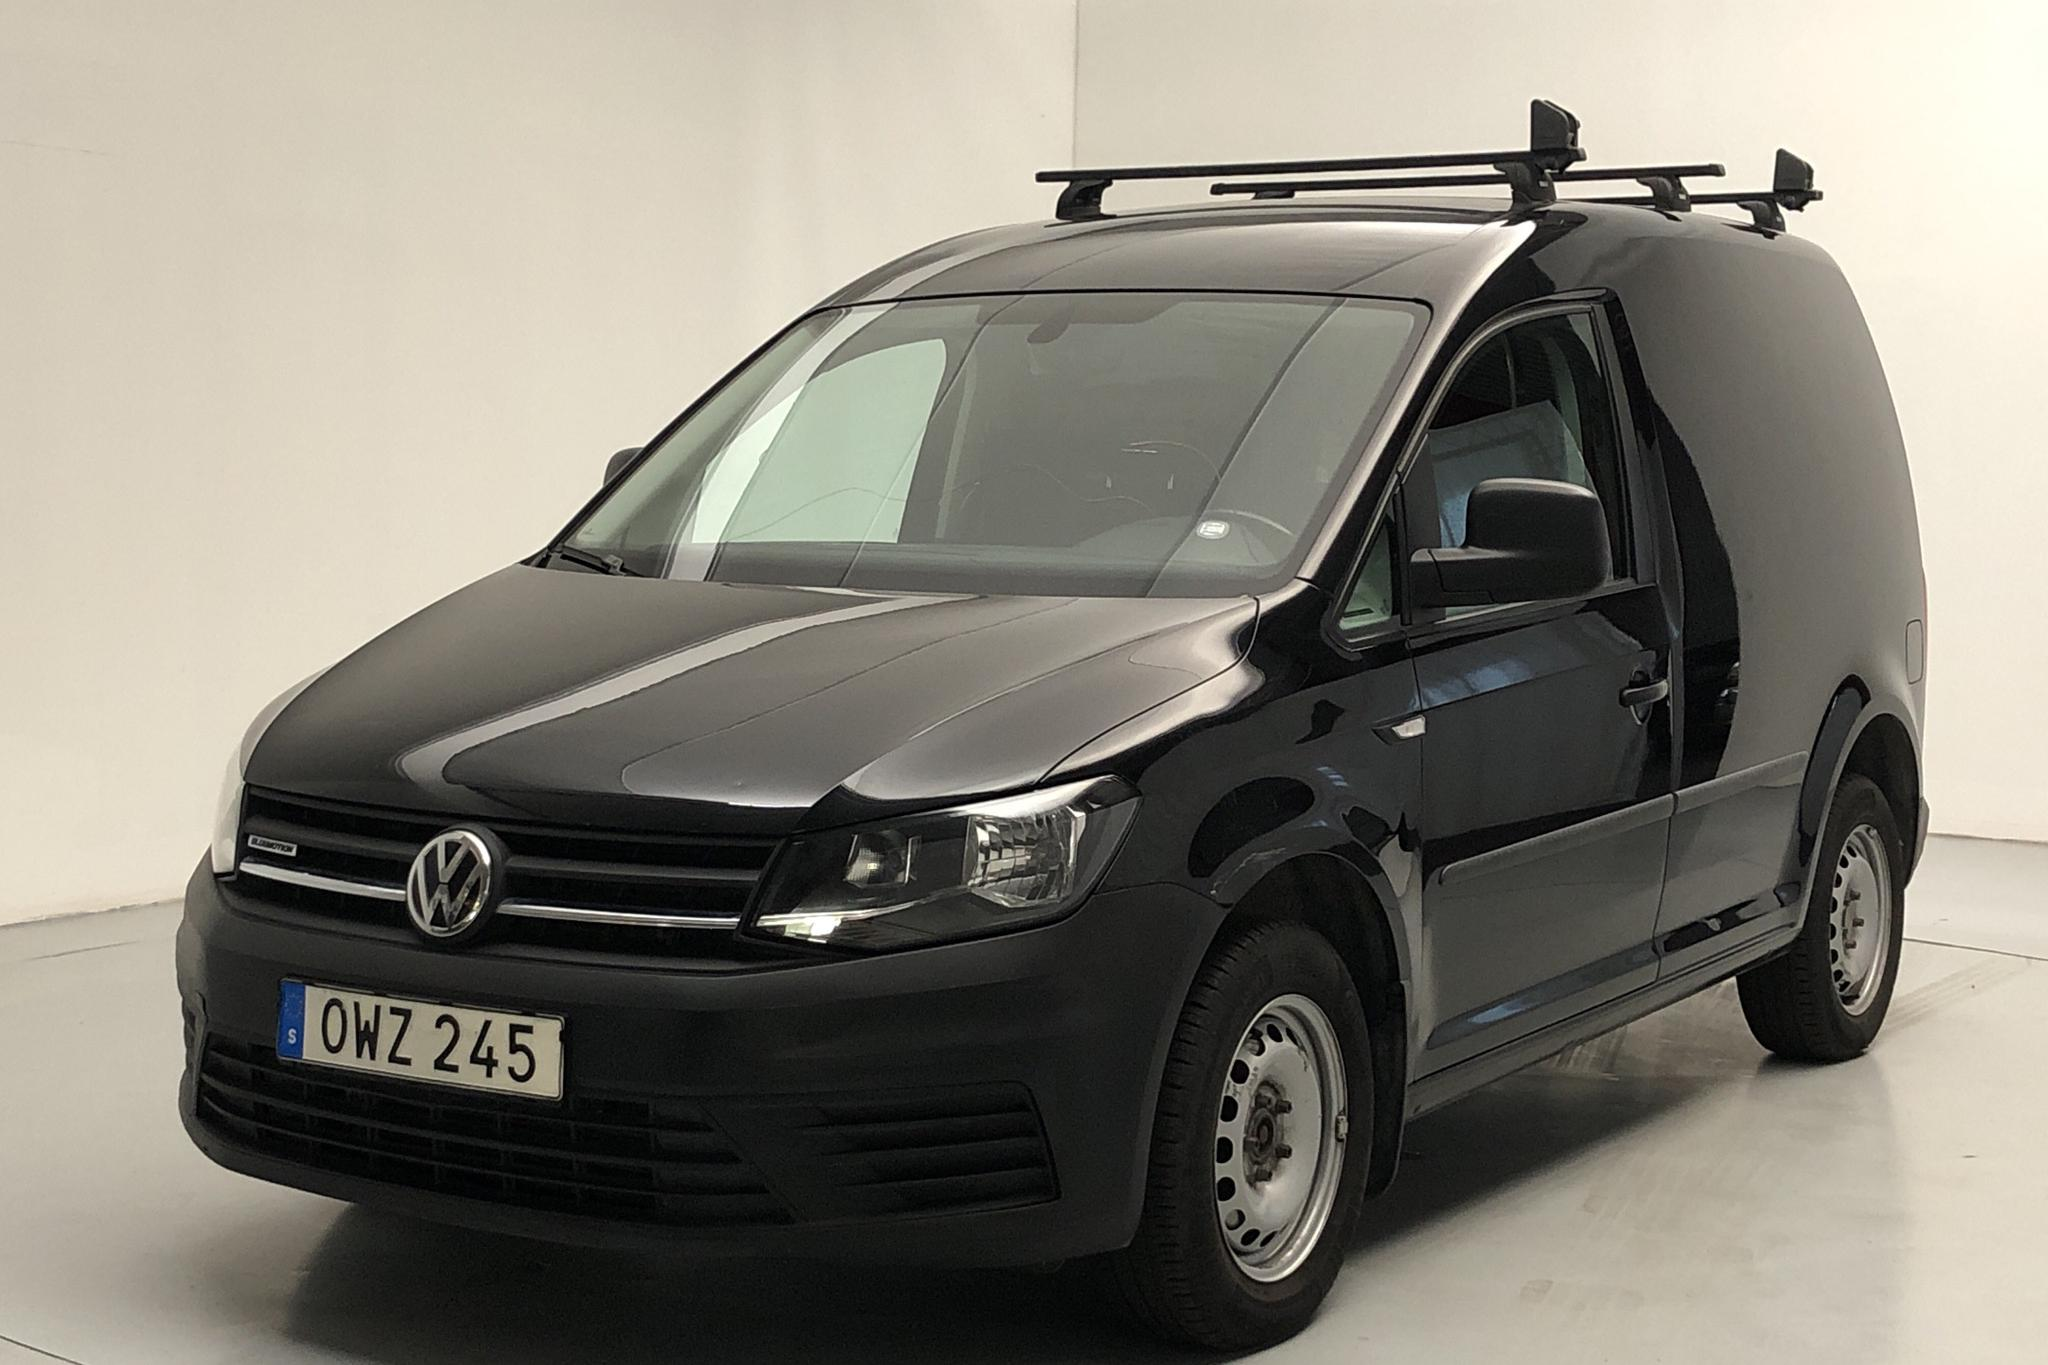 VW Caddy 1.4 TGI Skåp (110hk) - 5 333 mil - Manuell - svart - 2017